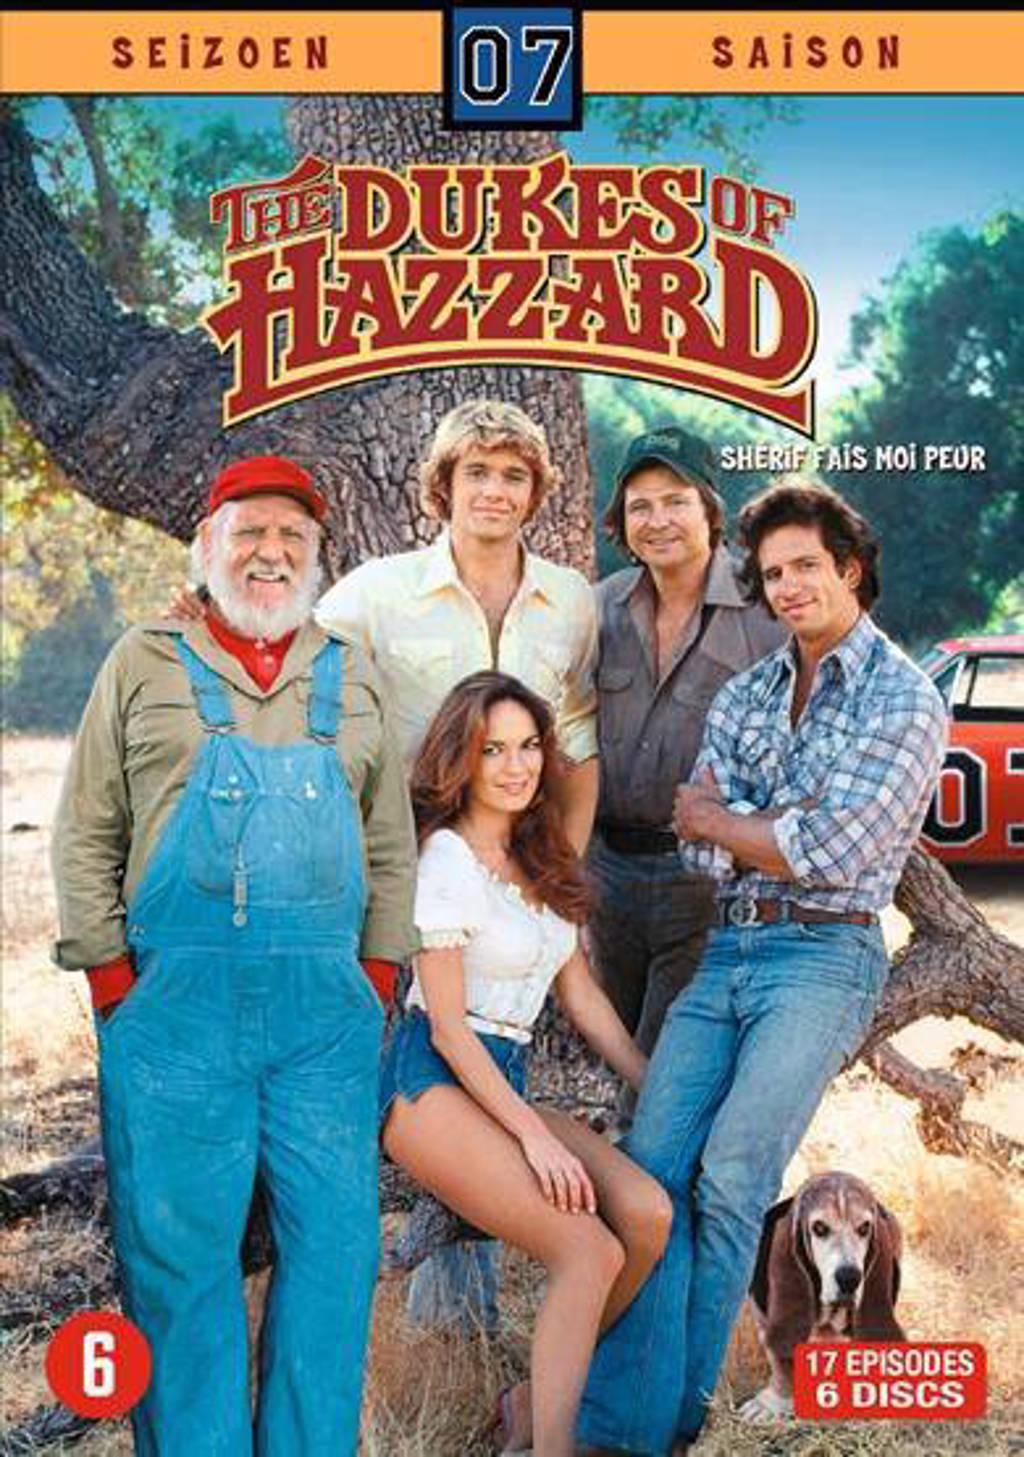 Dukes of Hazzard - Seizoen 7 (DVD)